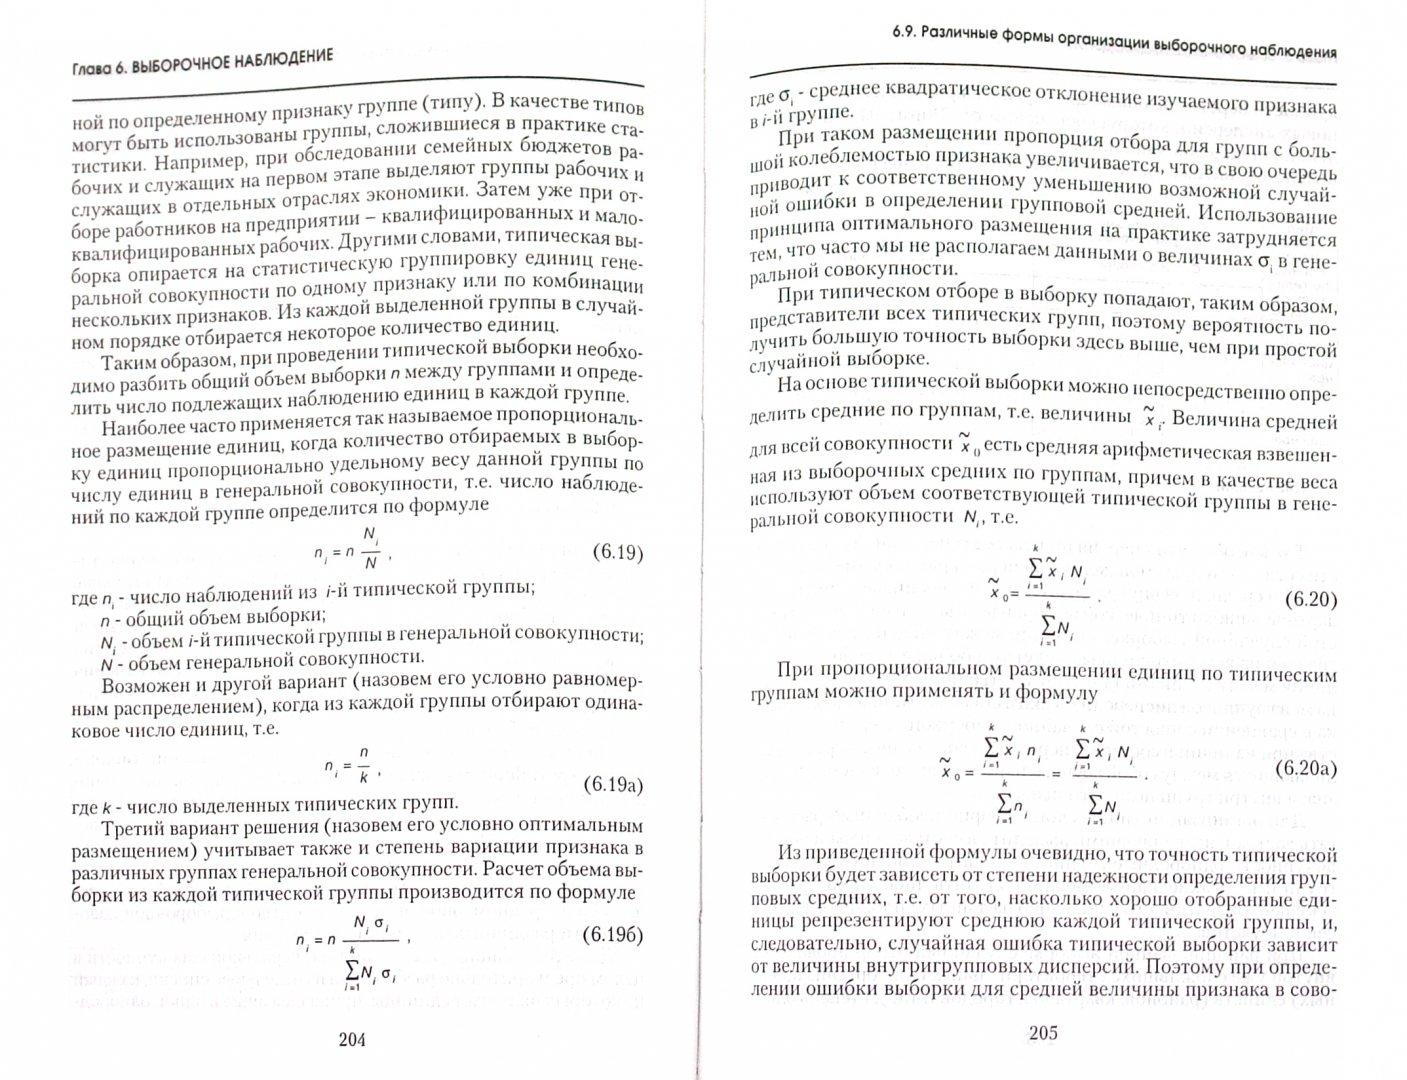 Иллюстрация 1 из 8 для Общая теория статистики - Ефимова, Петрова, Румянцев | Лабиринт - книги. Источник: Лабиринт